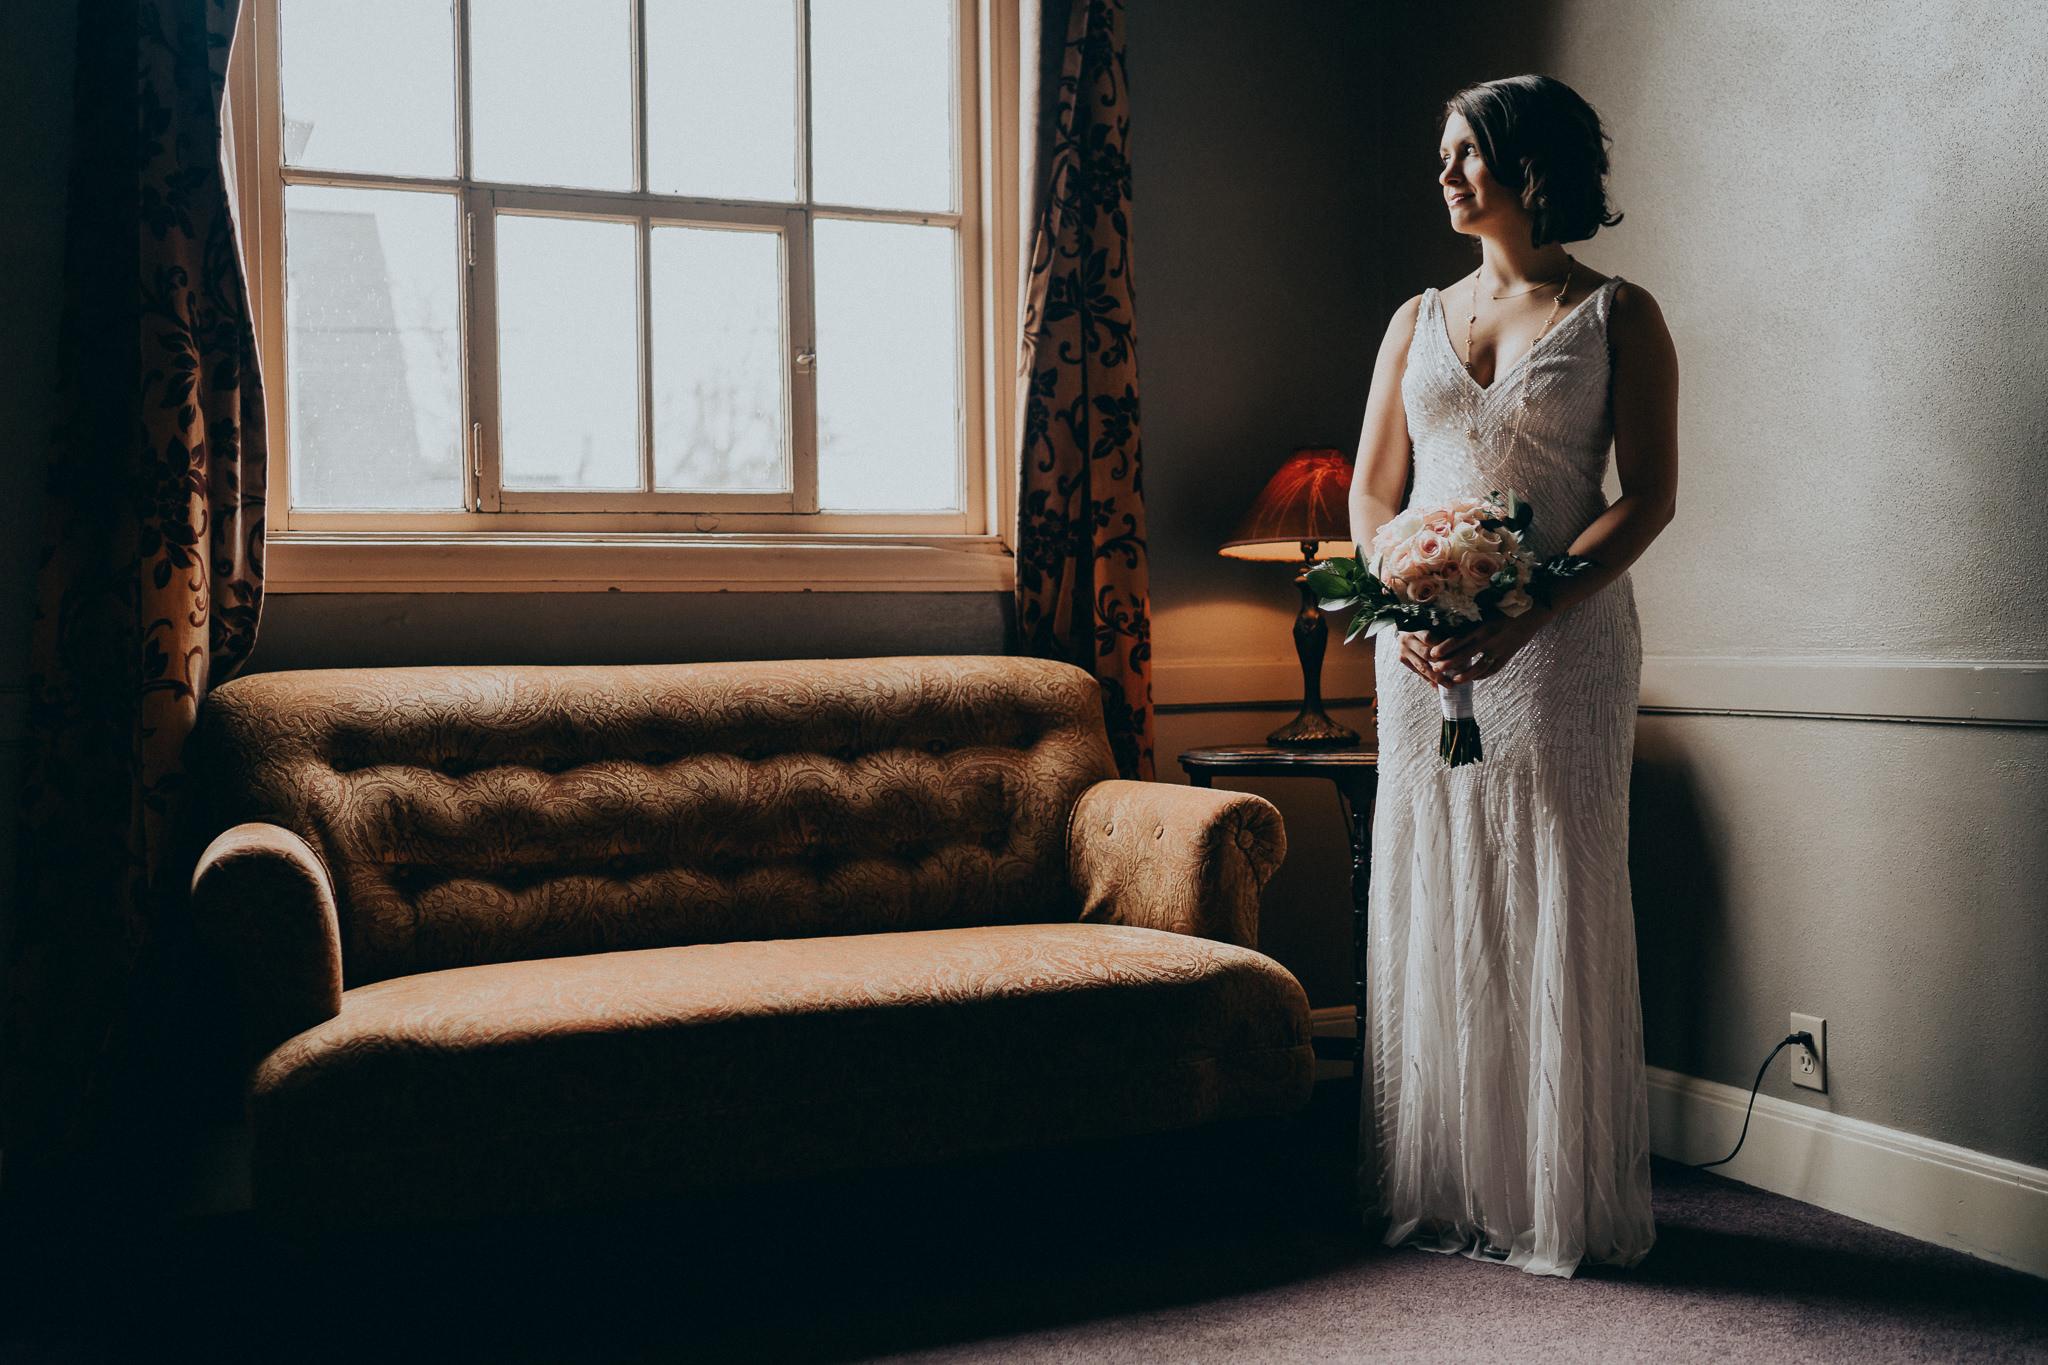 Bridal-Bride-Dress-Wedding-Portrait-Portland-Photographer